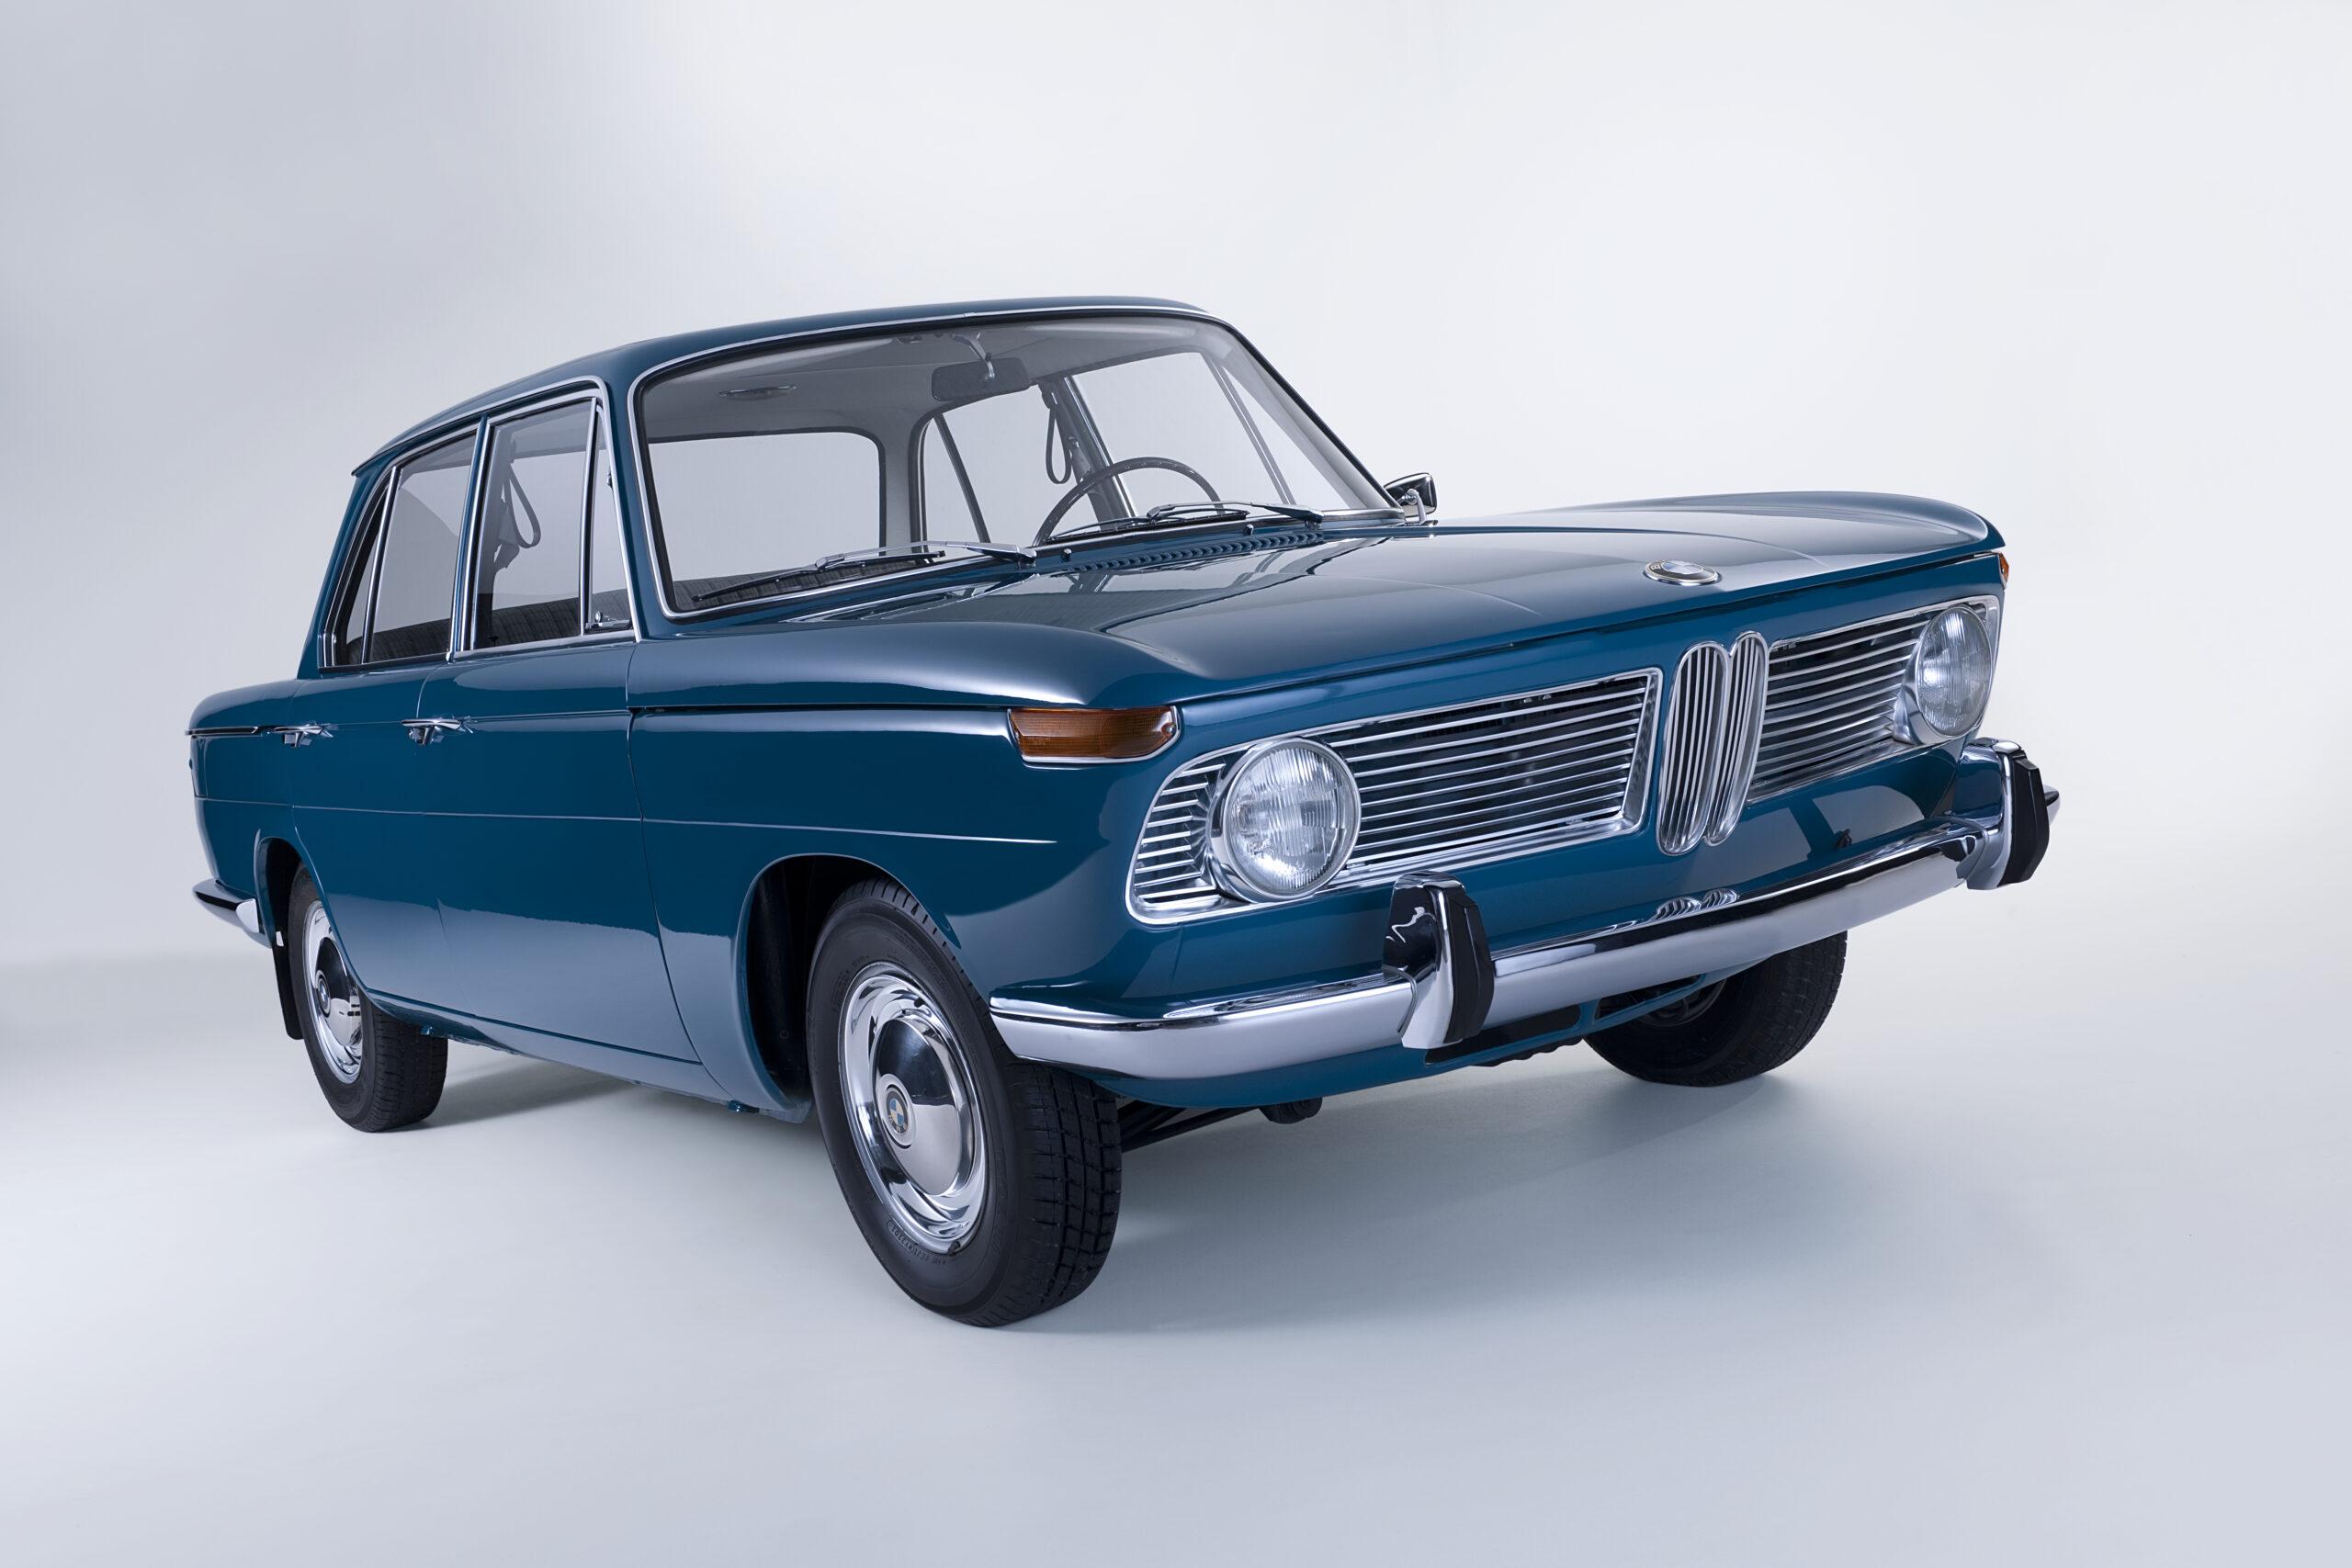 BMW New Class completa 60 anos como o primeiro sedã pequeno esportivo da marca